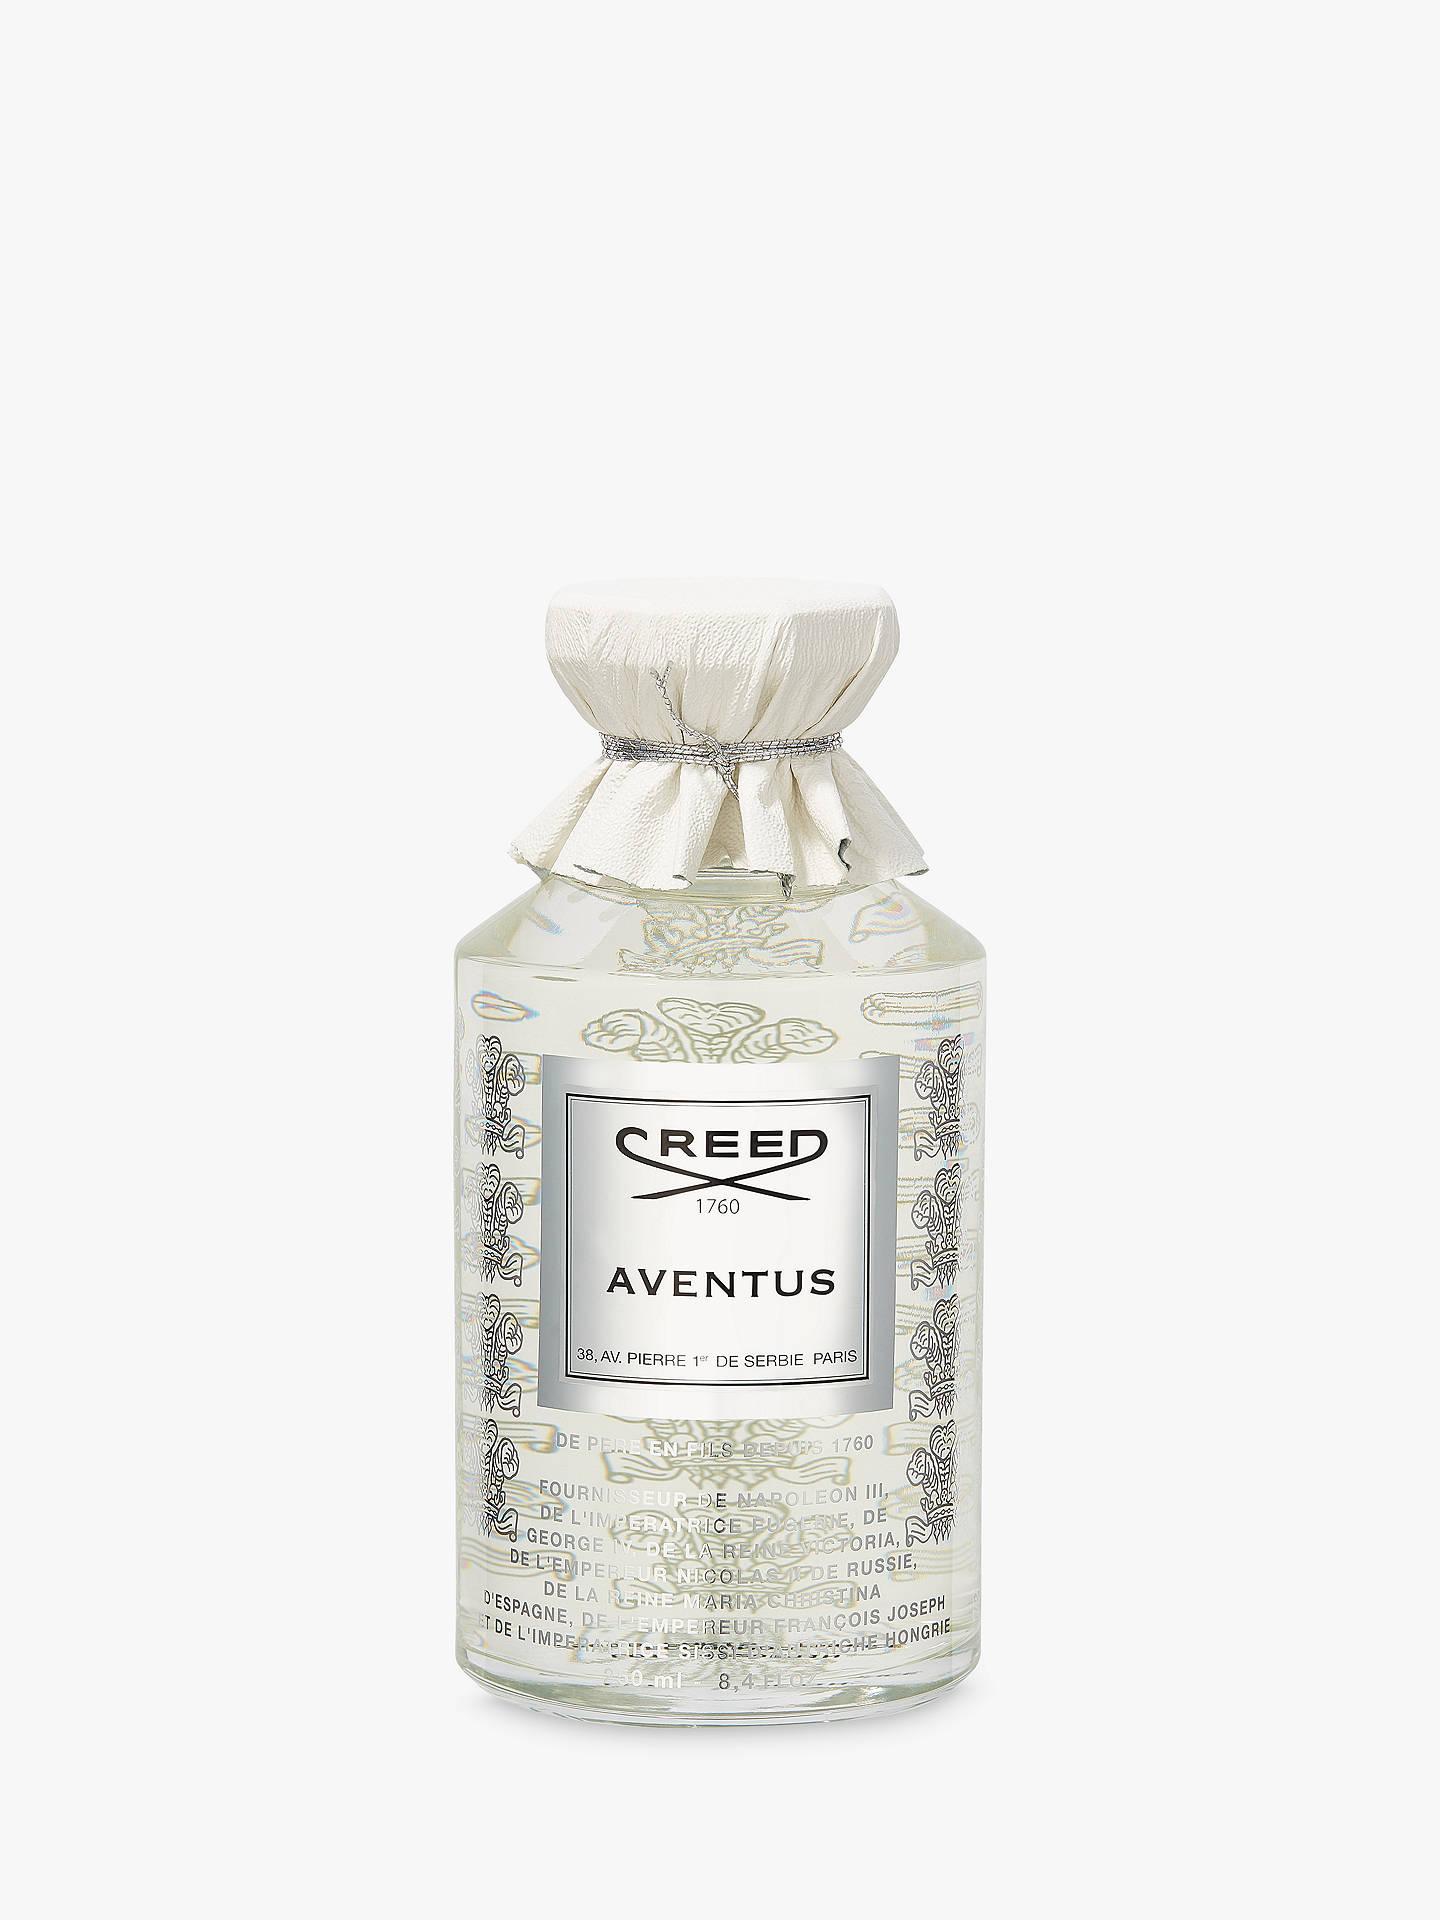 Creed Aventus Eau De Parfum Flacon 250ml At John Lewis Partners